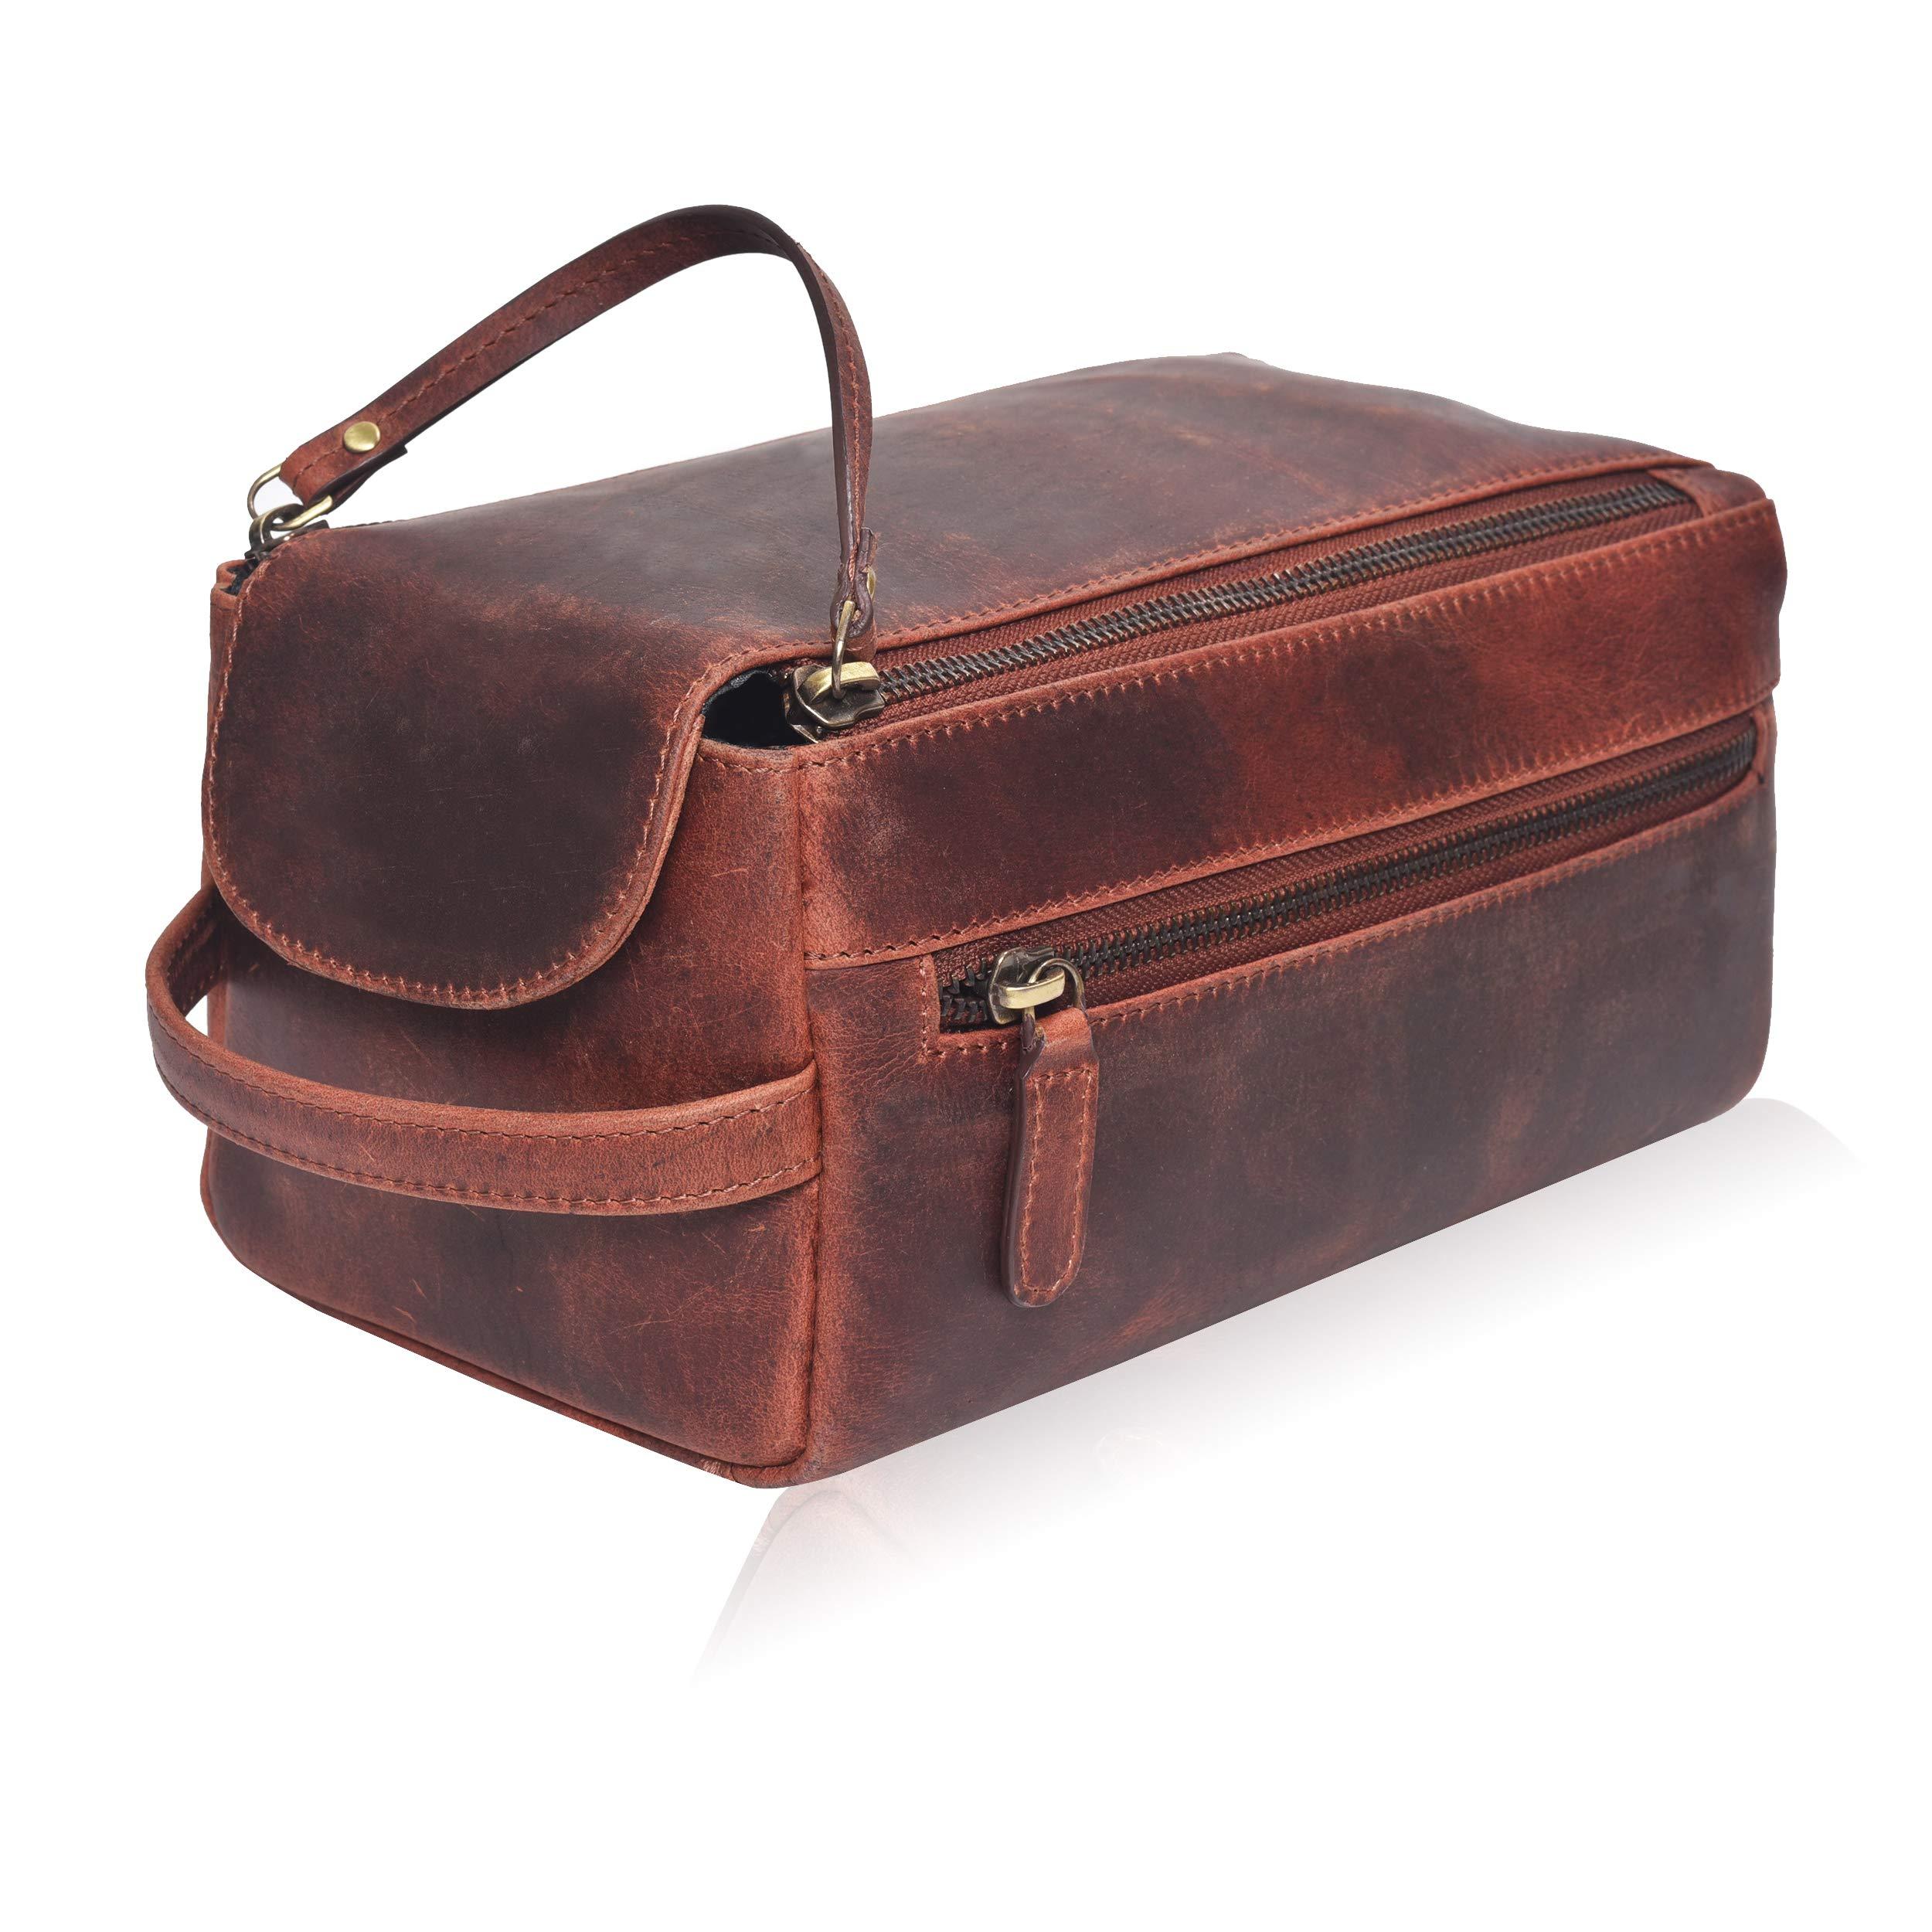 Leather Toiletry Bag for Men - Mens Dopp Kit Bathroom Shaving Bags Travel Case Hanging Hygeine Men's Toiletries (Brown Hunter Crazy Horse Traditional)